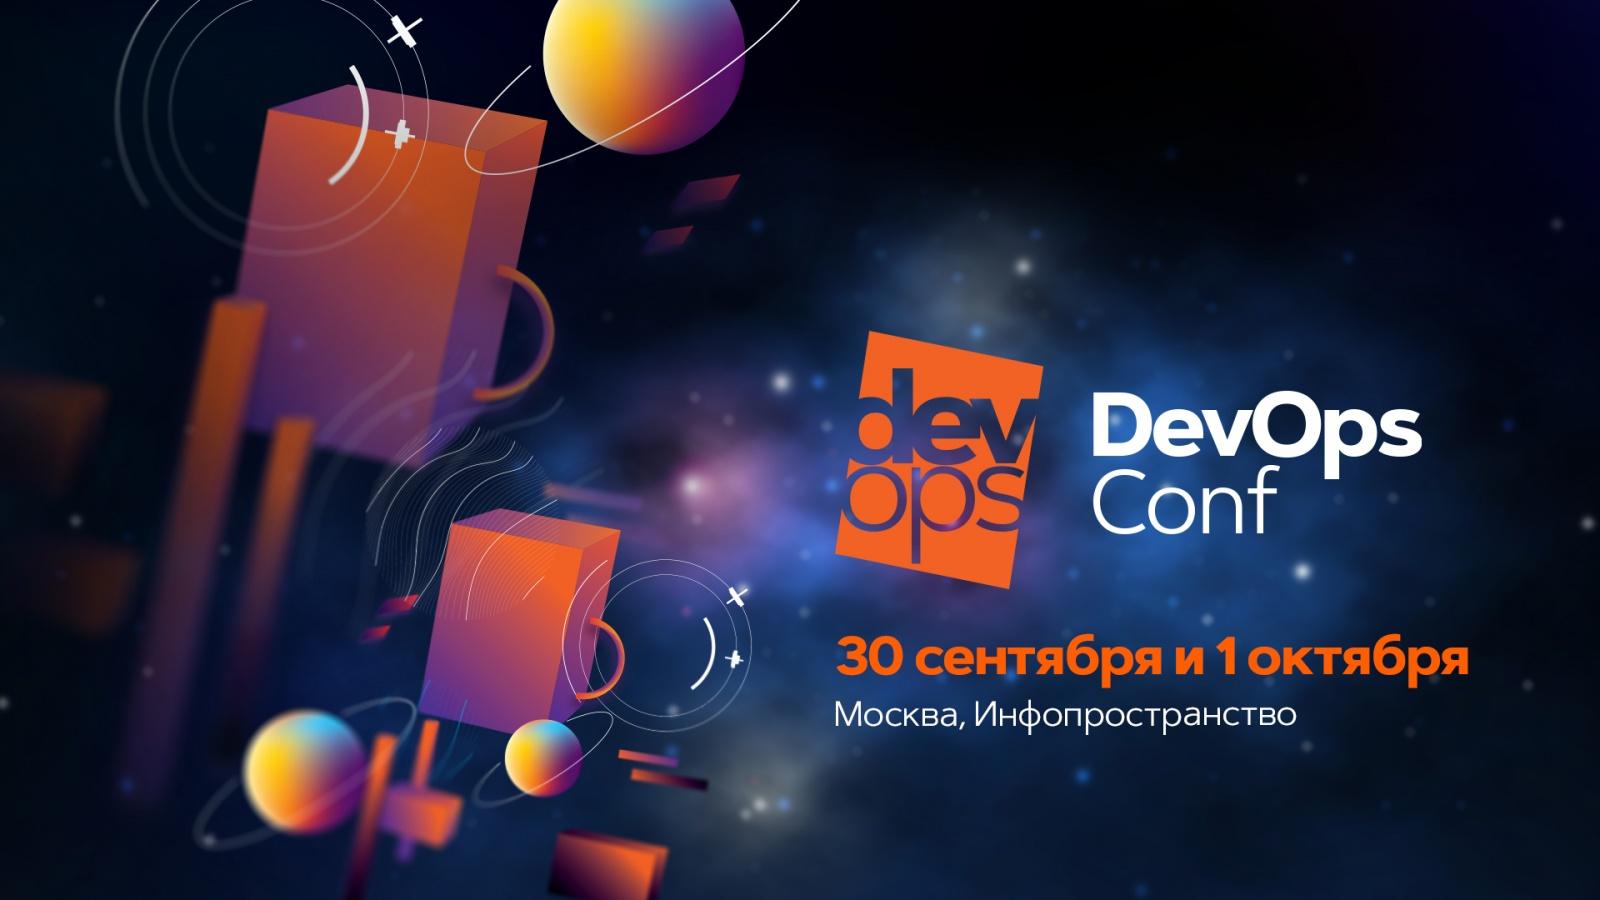 Путеводитель по галактике DevOpsConf 2019 - 1